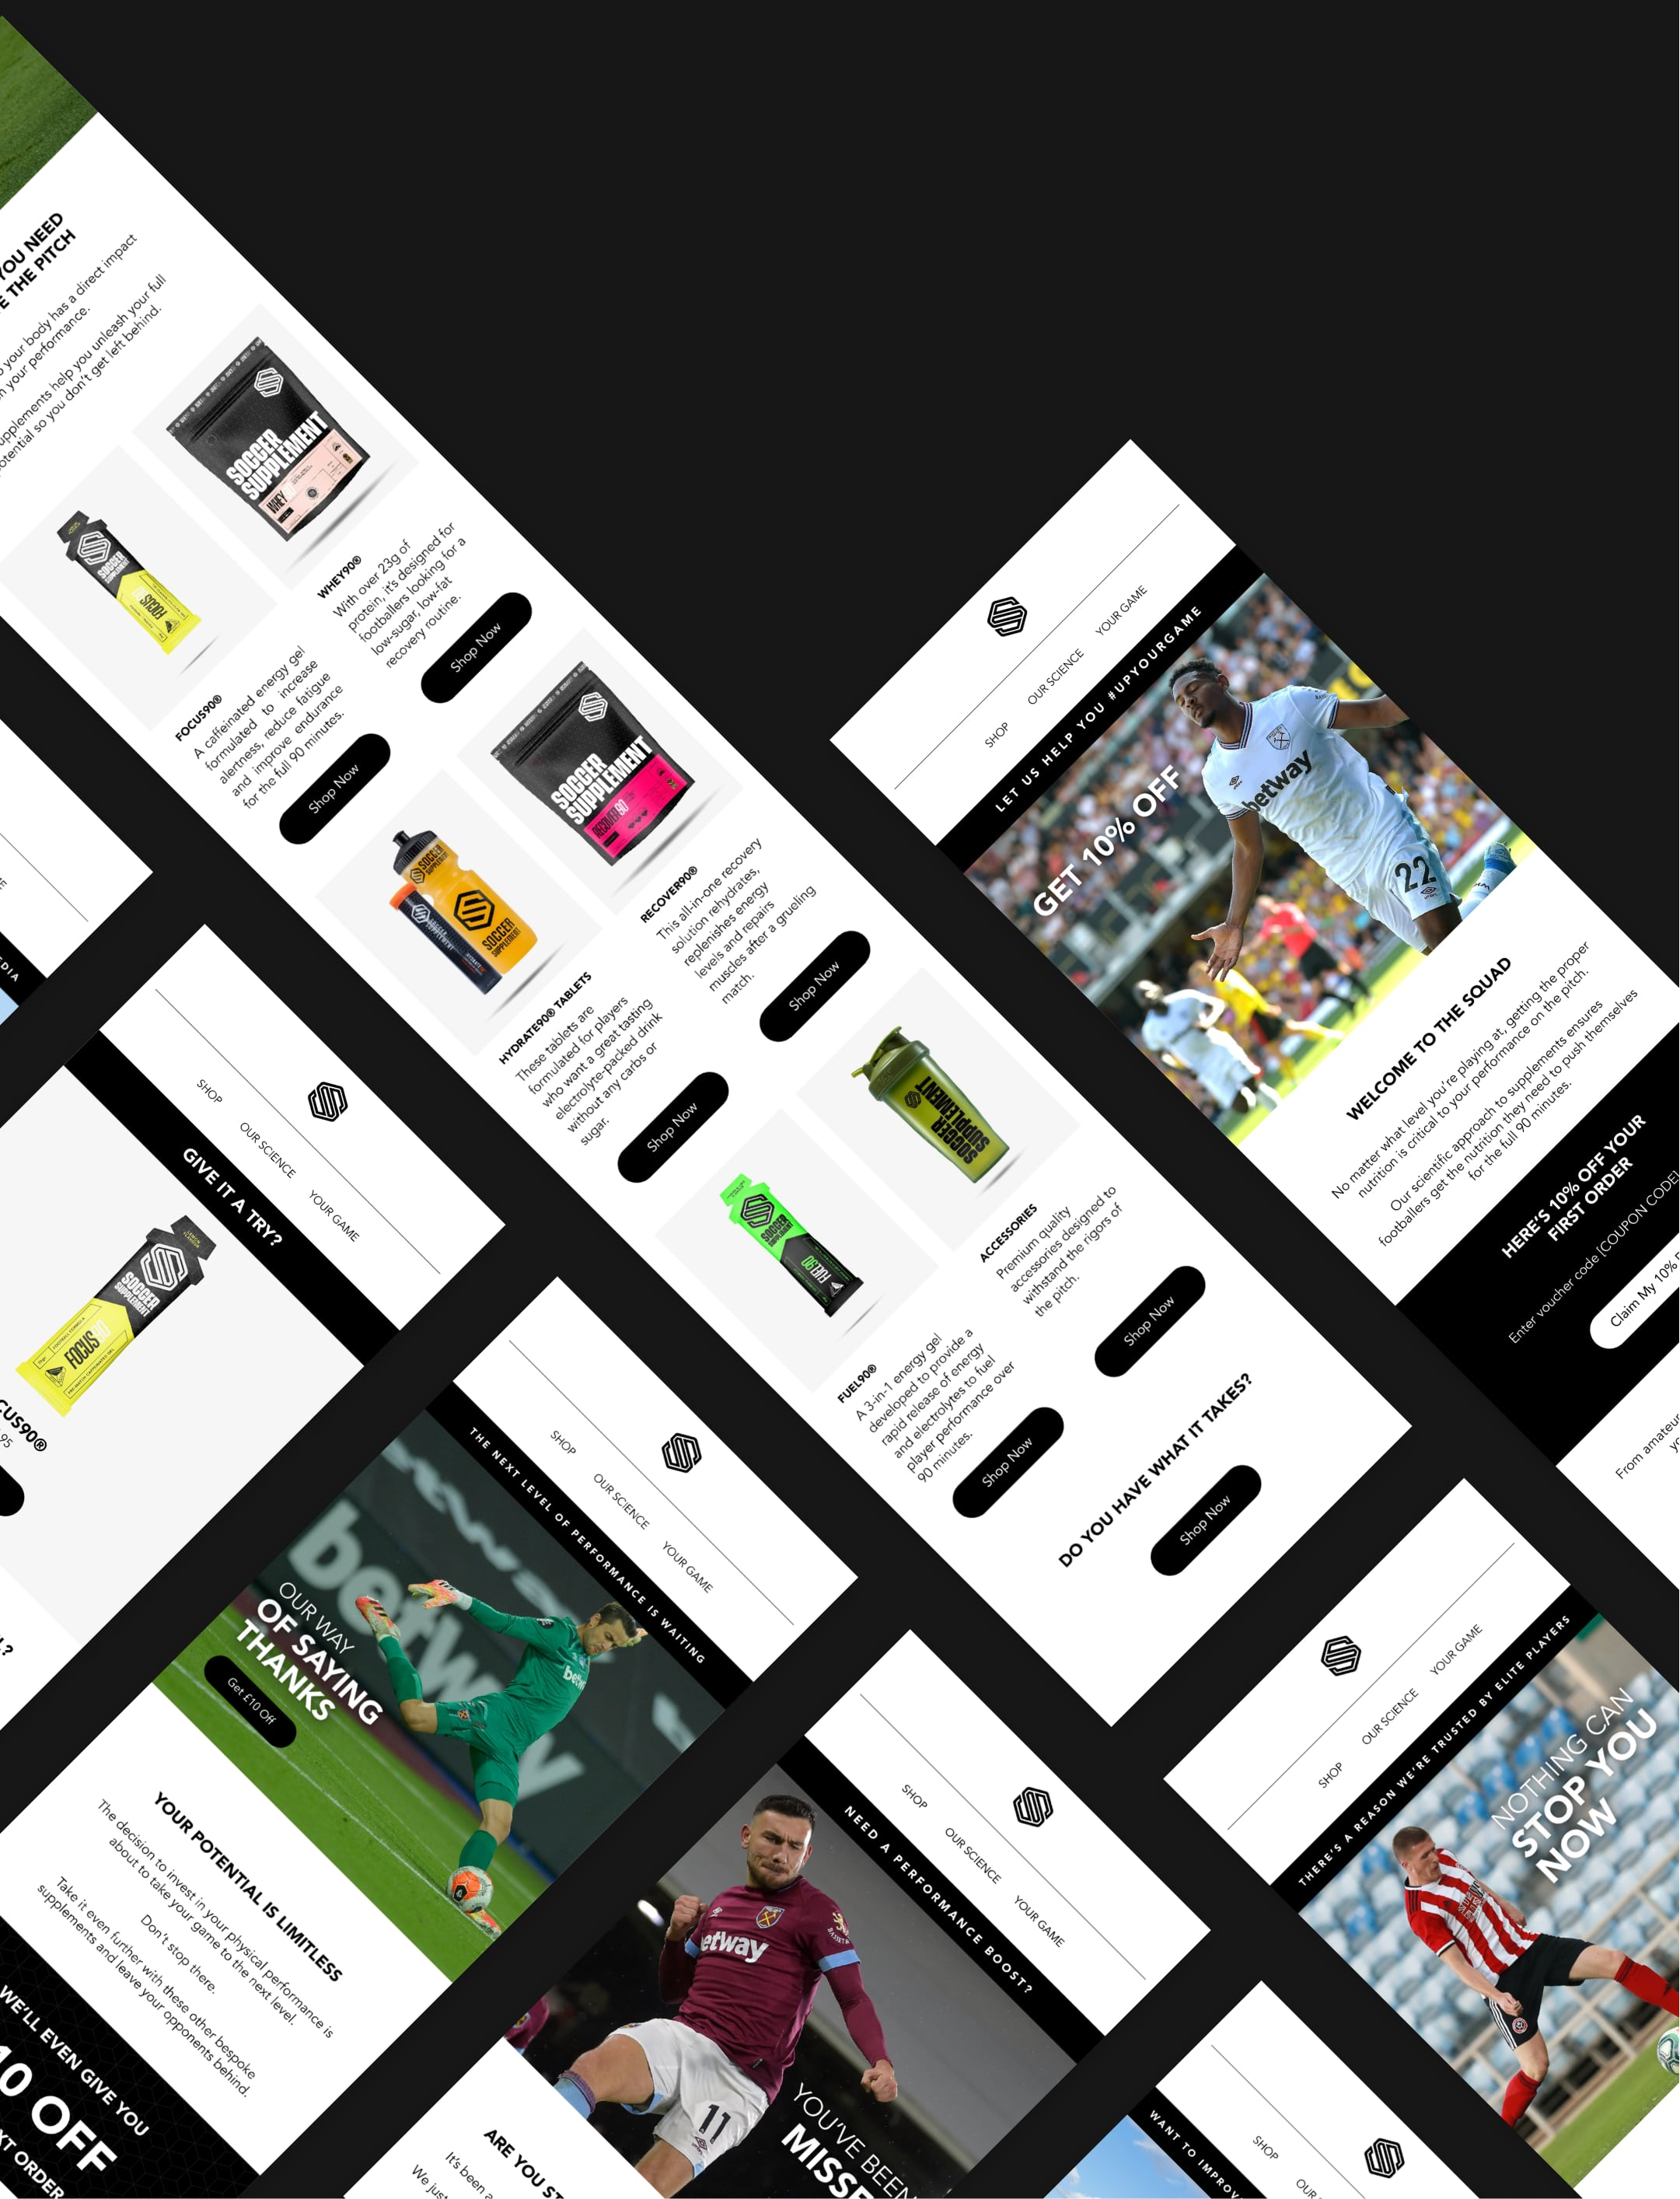 Design screens